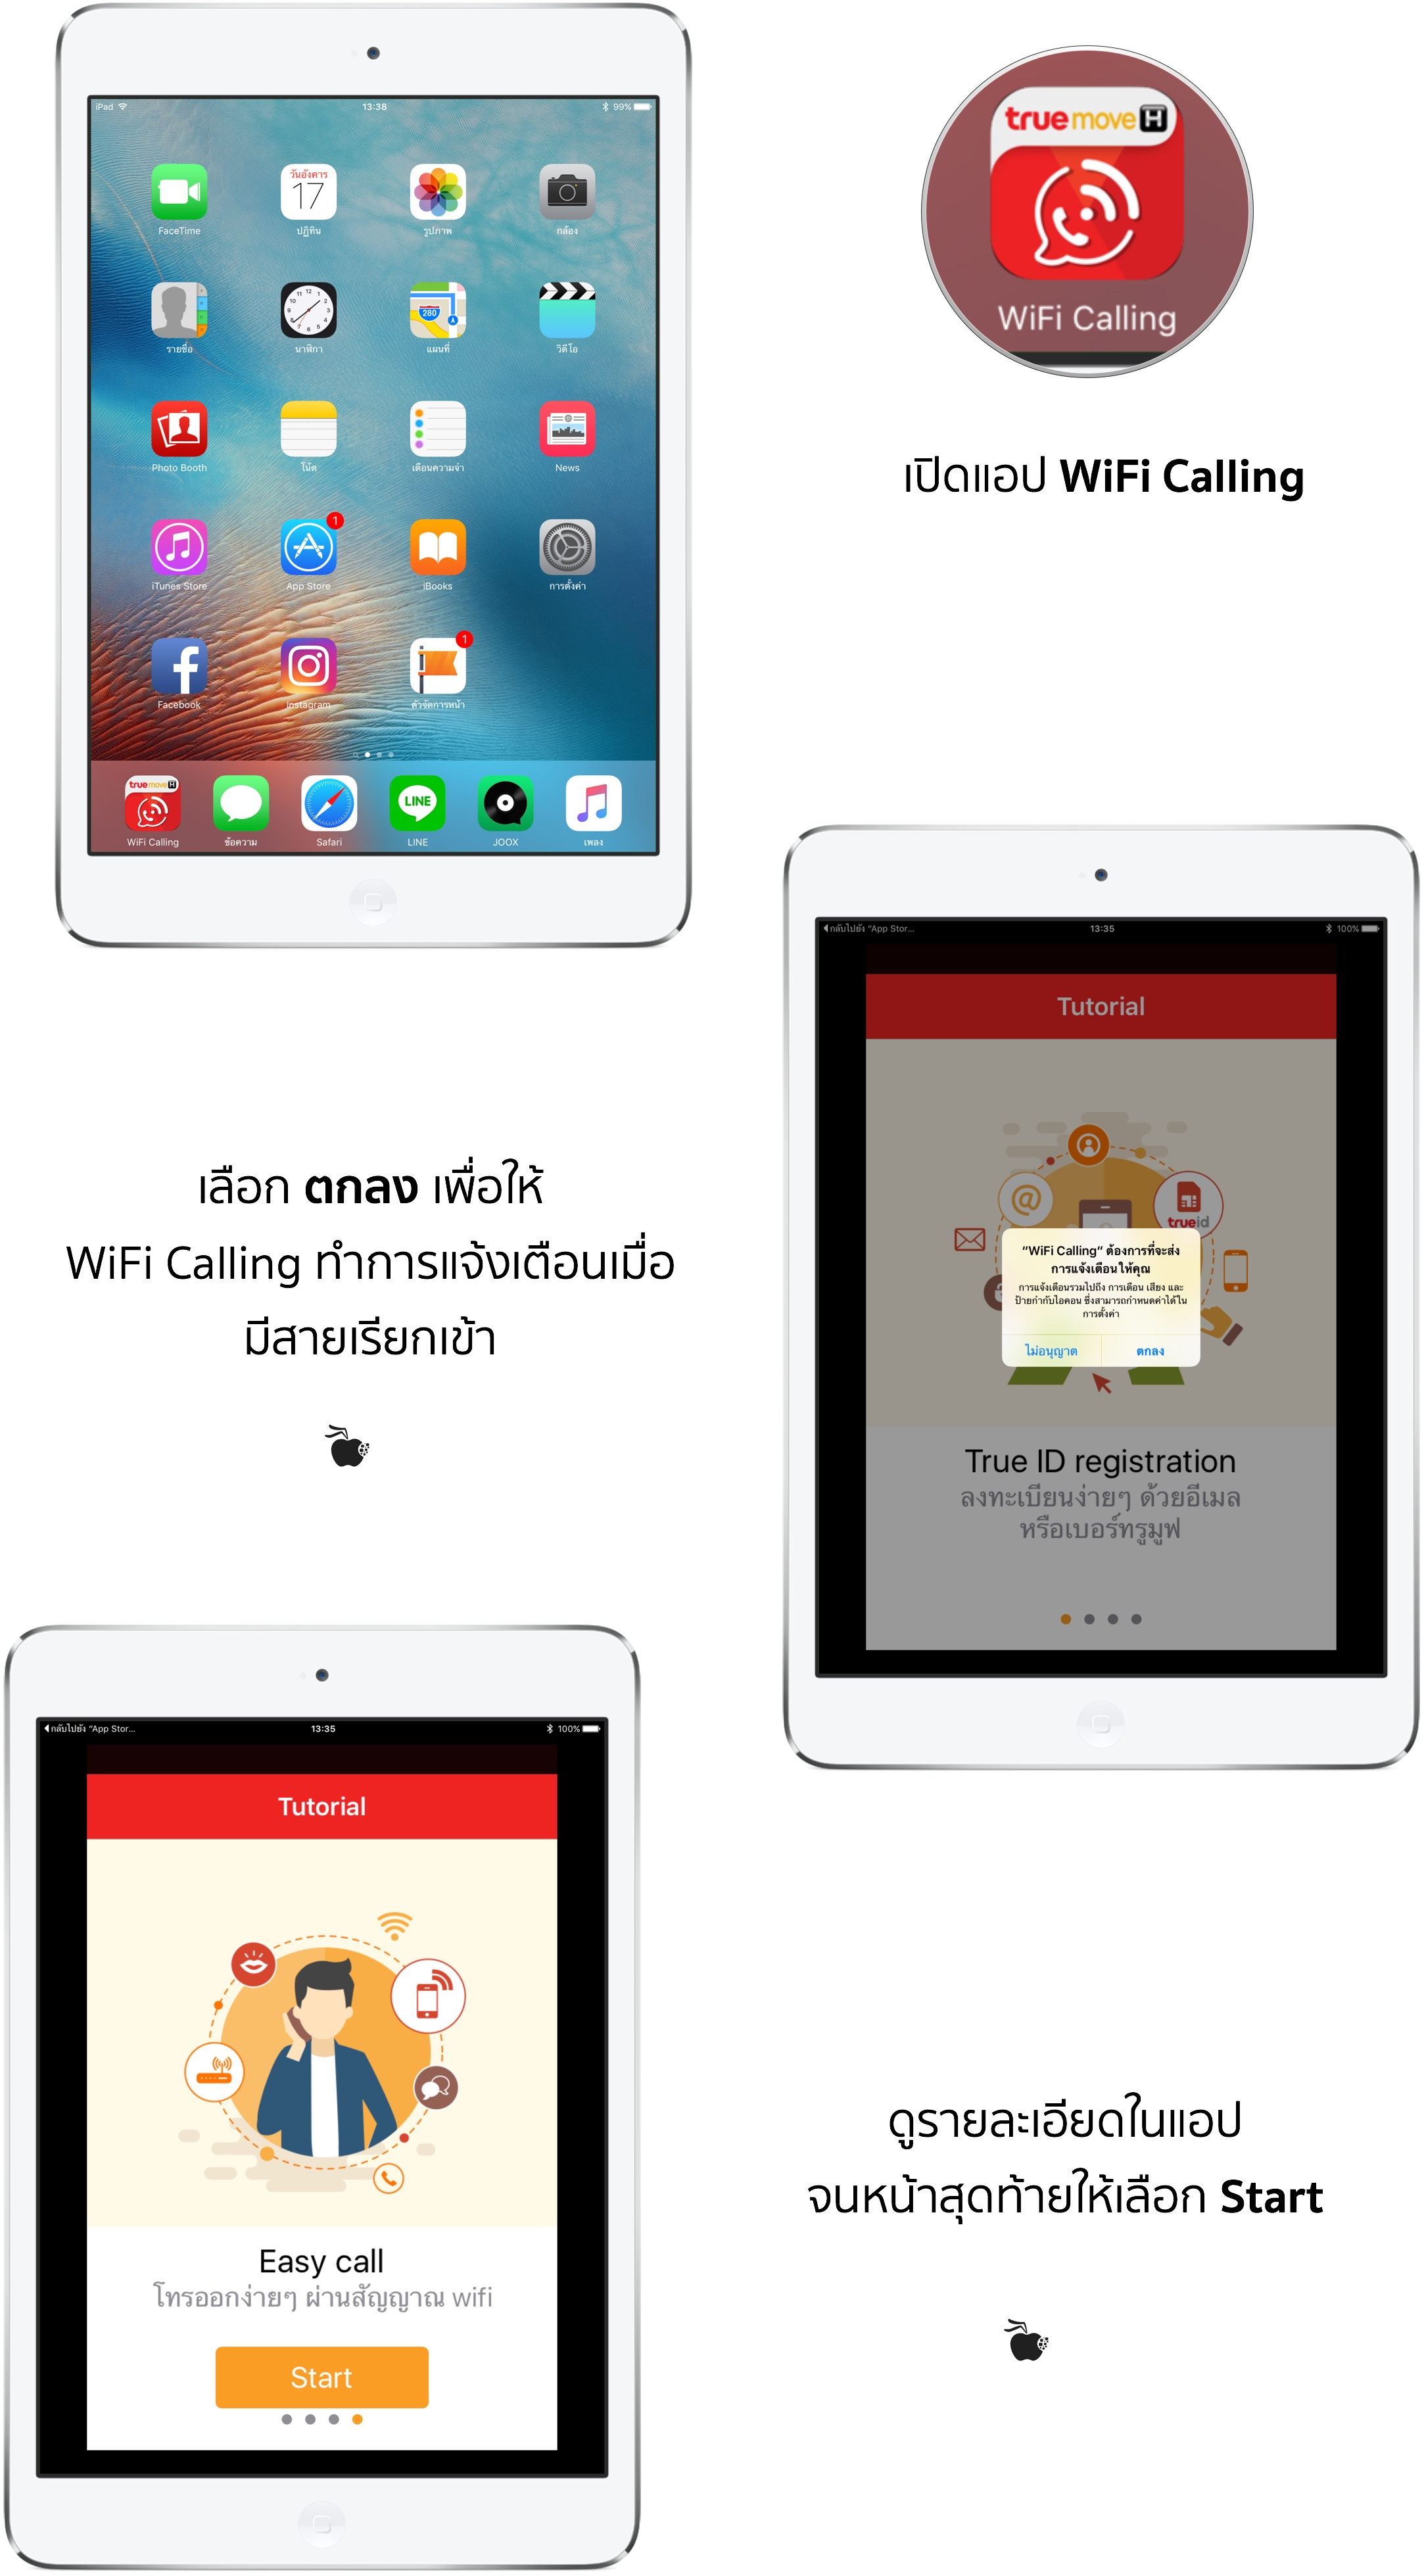 run-wifi-calling-app